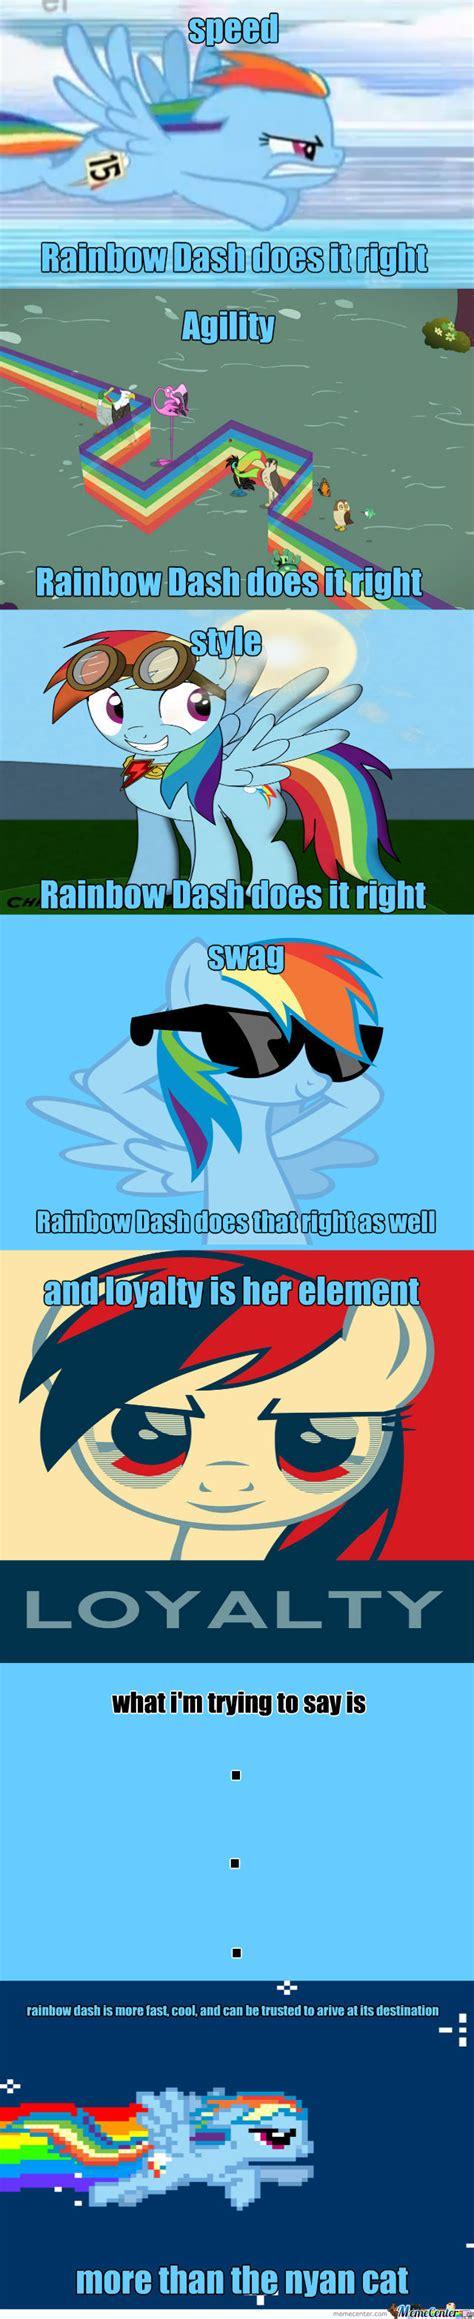 Rainbow Dash Meme - why rainbow dash is the new nyan cat by radon online meme center